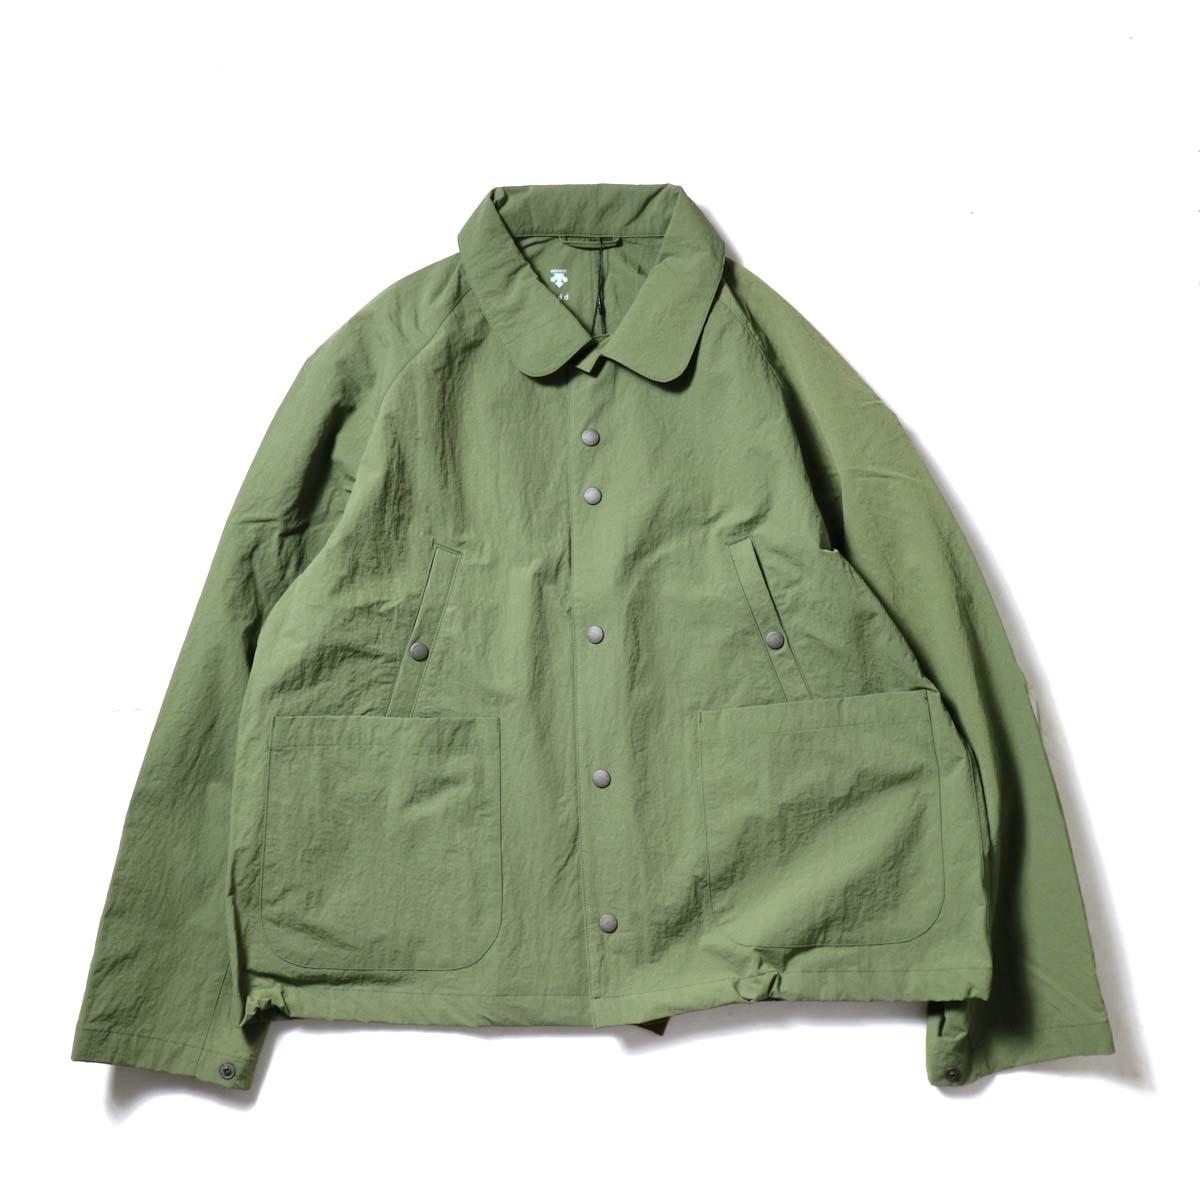 DESCENTE ddd / SWING COACH JACKET (Khaki)正面